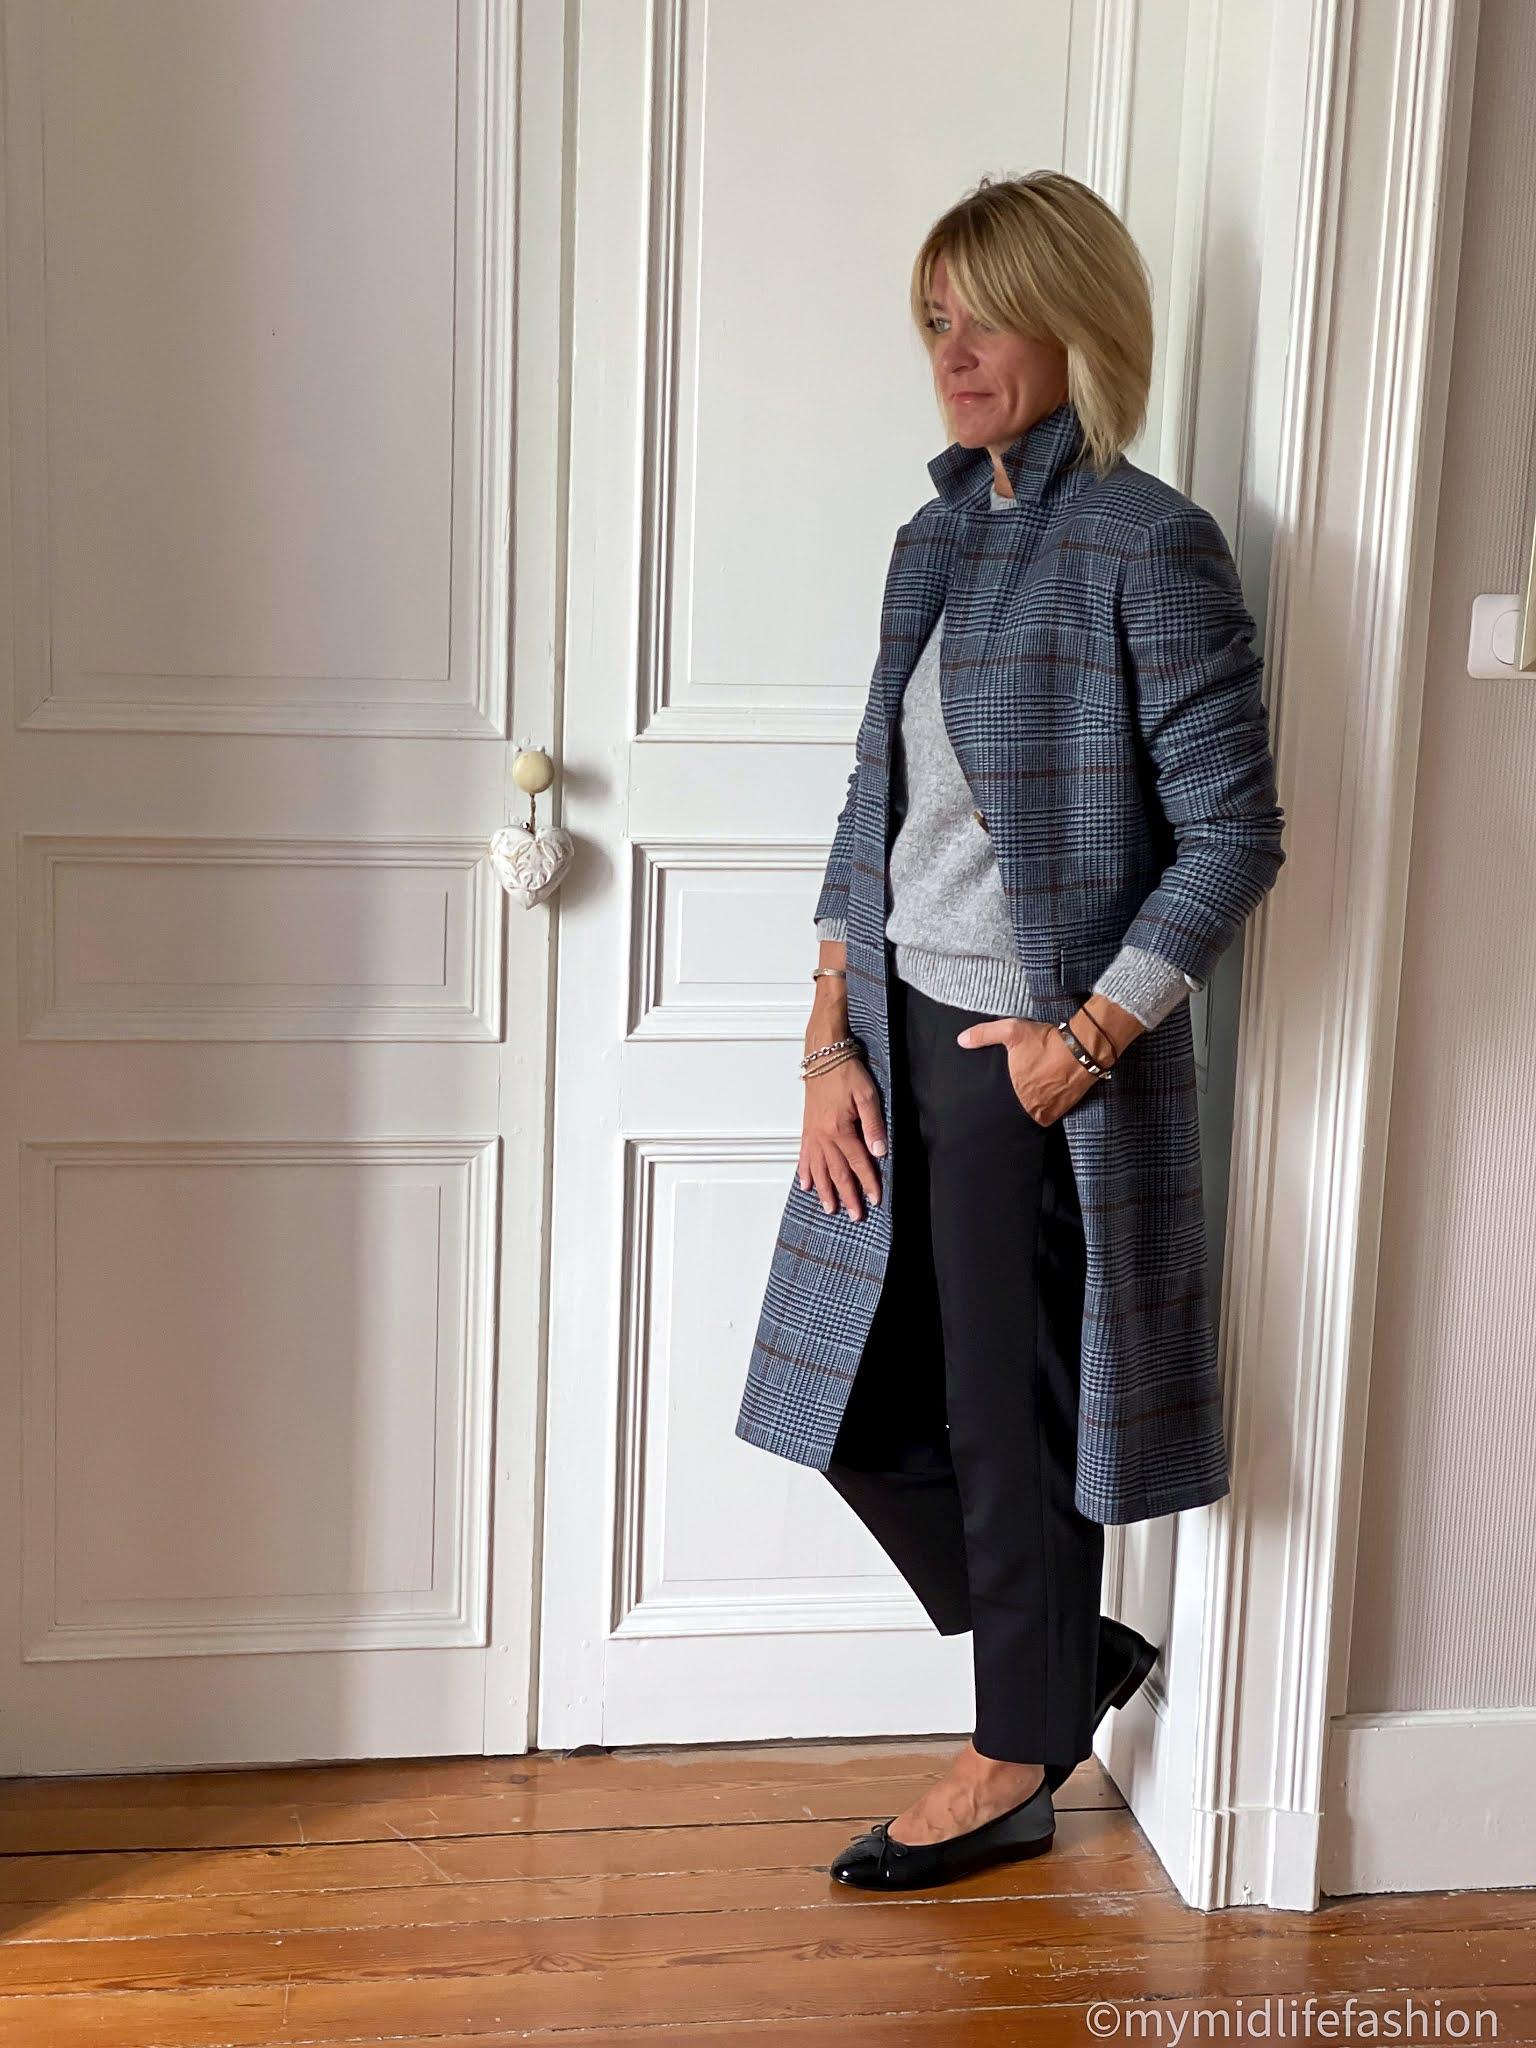 My midlife fashion, Baukjen shannon jumper, baukjen agnes coat, baukjen the cigarette pant, Chanel quilted handbag, Chanel ballet pumps, Chanel brooch, Valentino rockstud bracelet